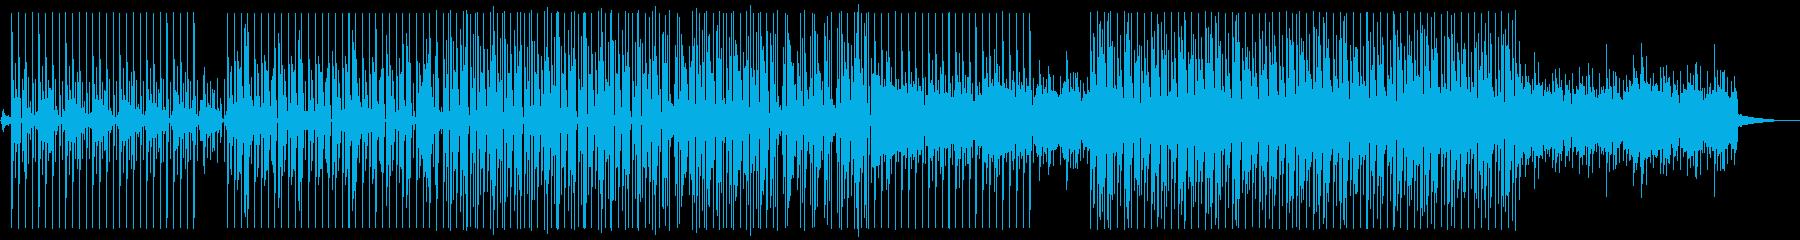 POPなイラストレーションで描かれた宇宙の再生済みの波形